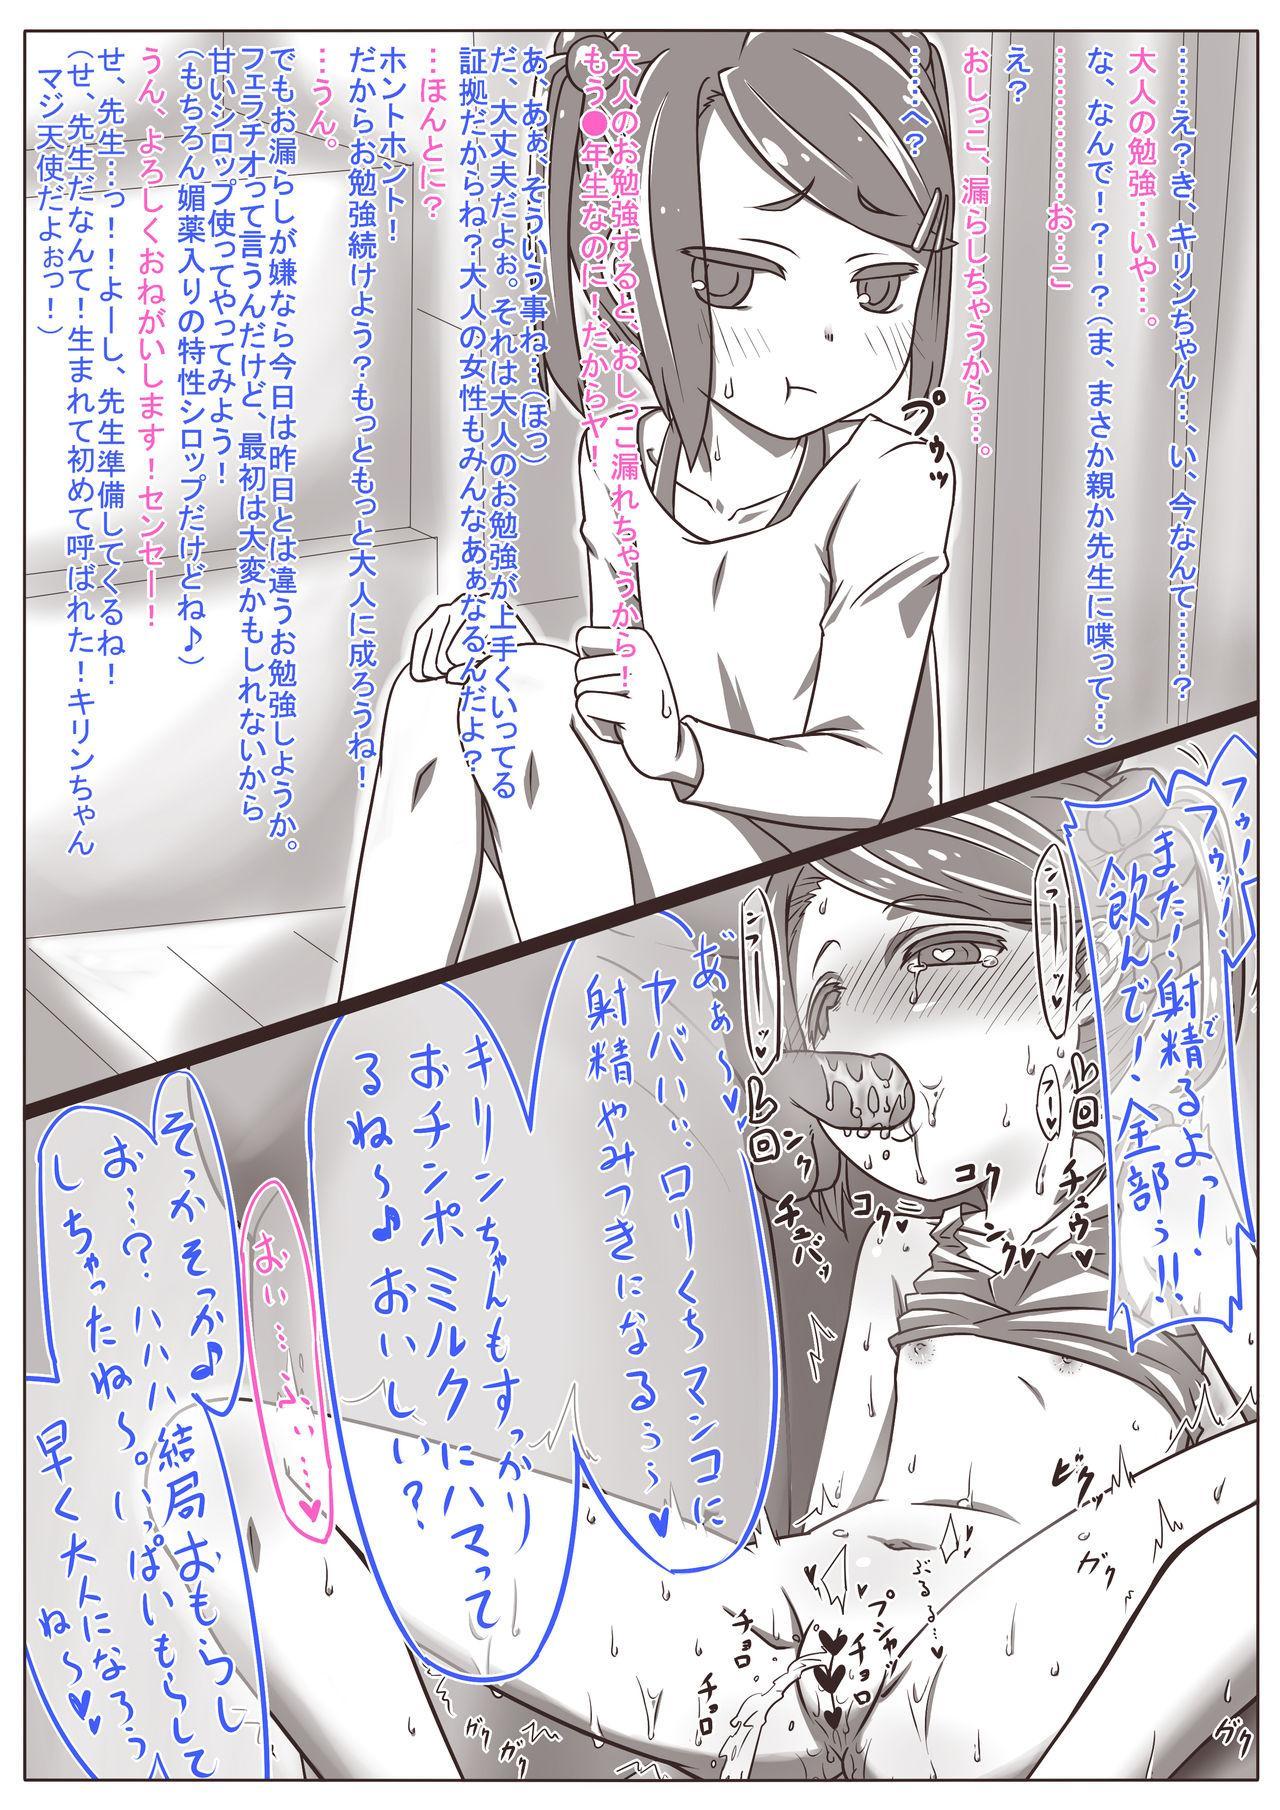 Hitozuma Kirika 121